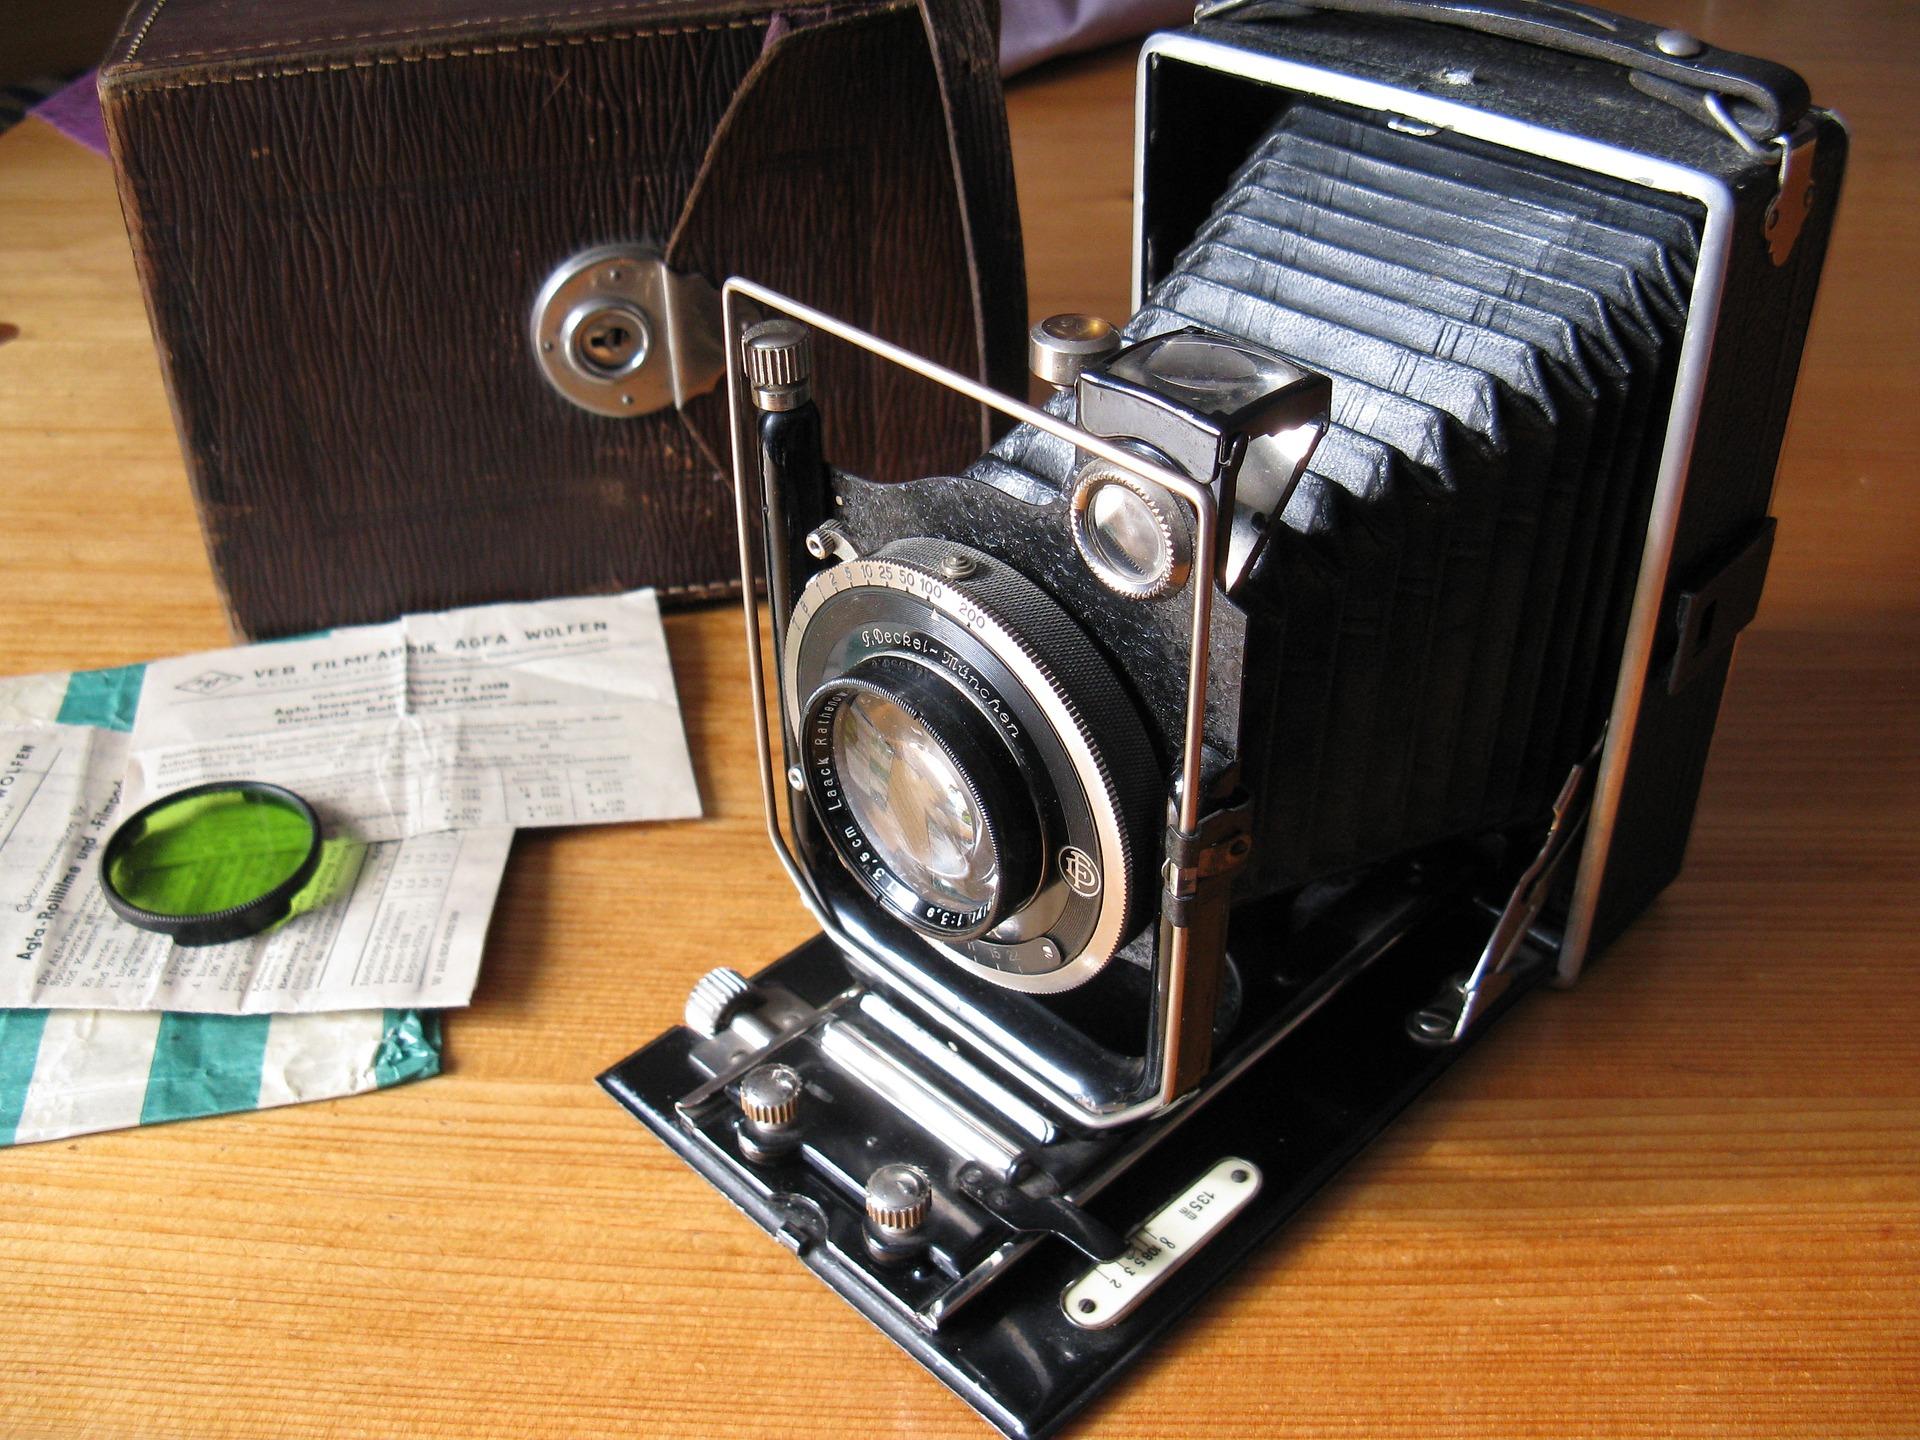 Kamera, Jahrgang, alt, Foto-Kamera, Erinnerungen, Fotografie - Wallpaper HD - Prof.-falken.com